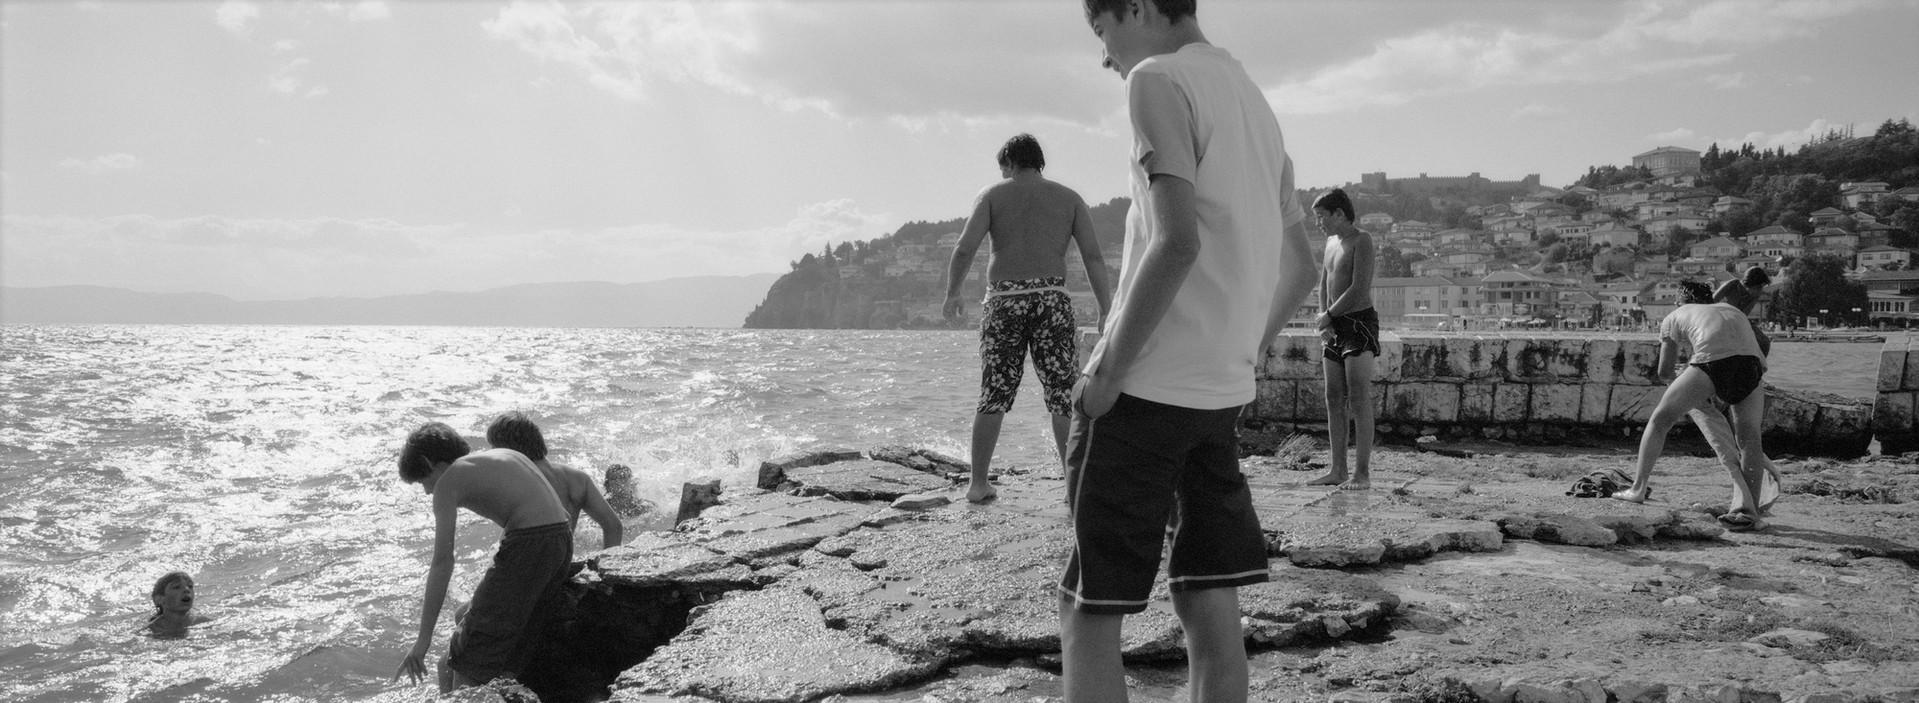 By the Lake, Lake Ohrid, Macedonië 2005